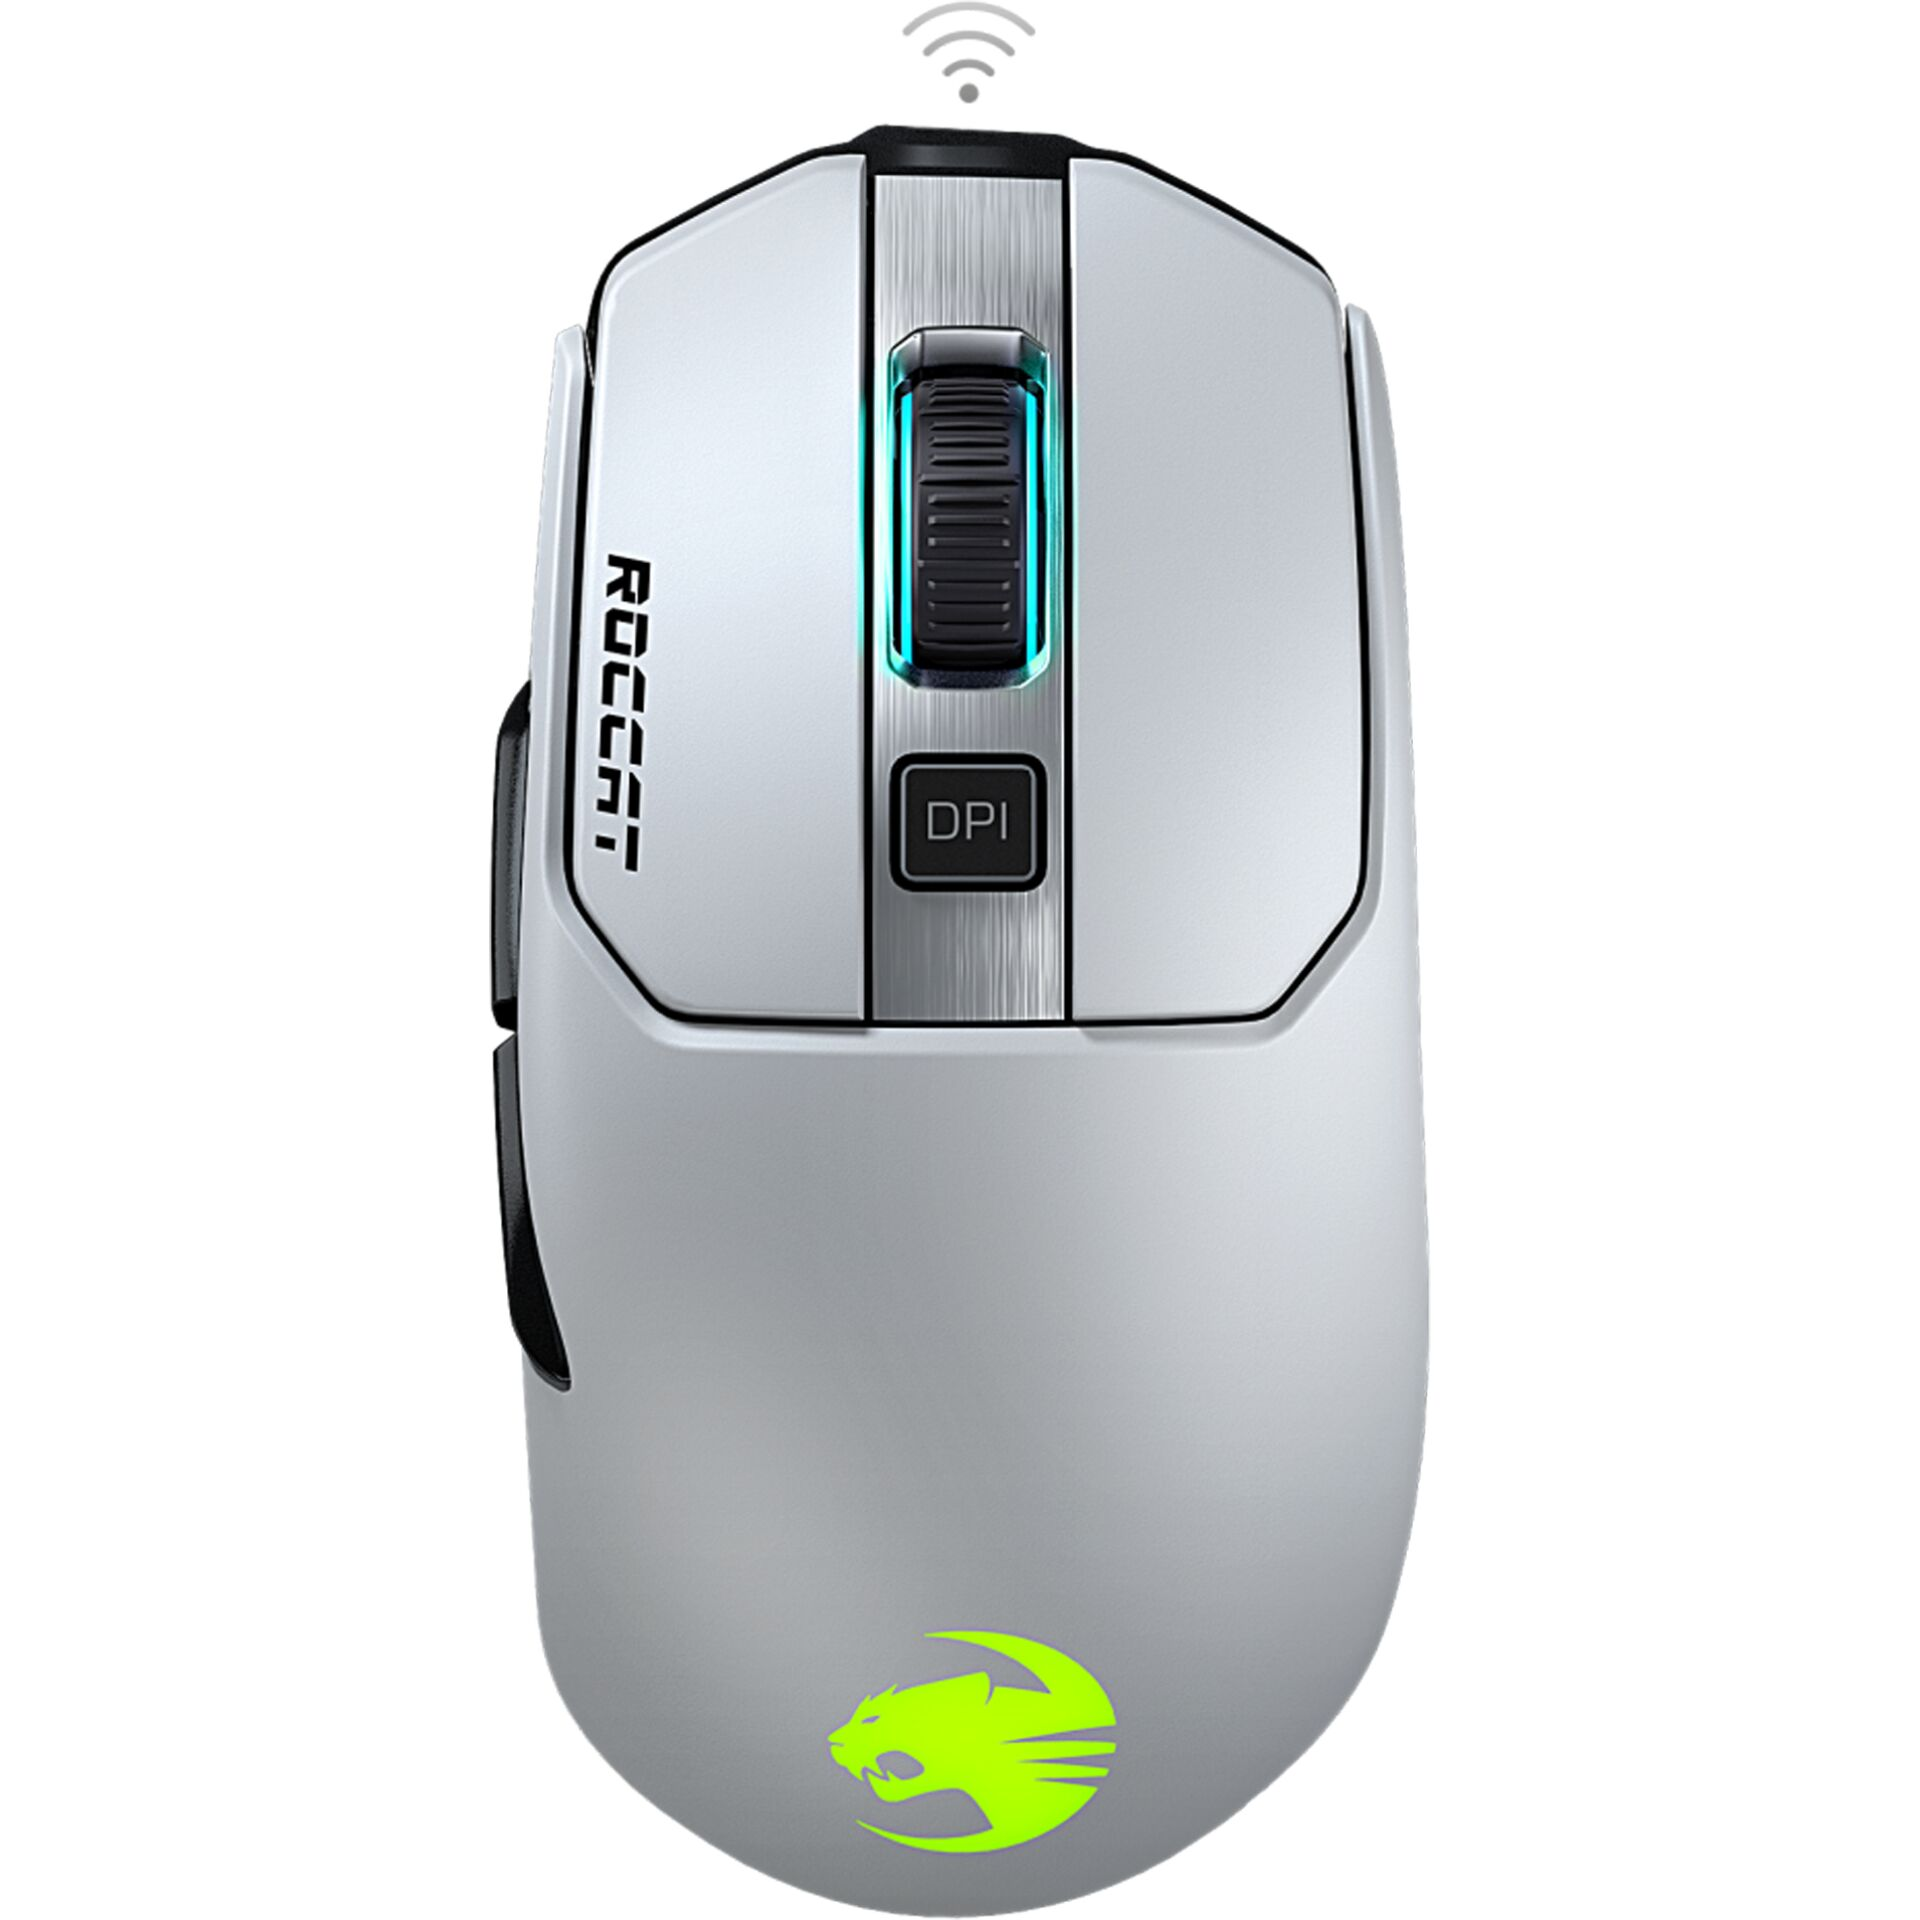 Roccat Kain 202 AIMO RGB kabellos Gaming mouse white